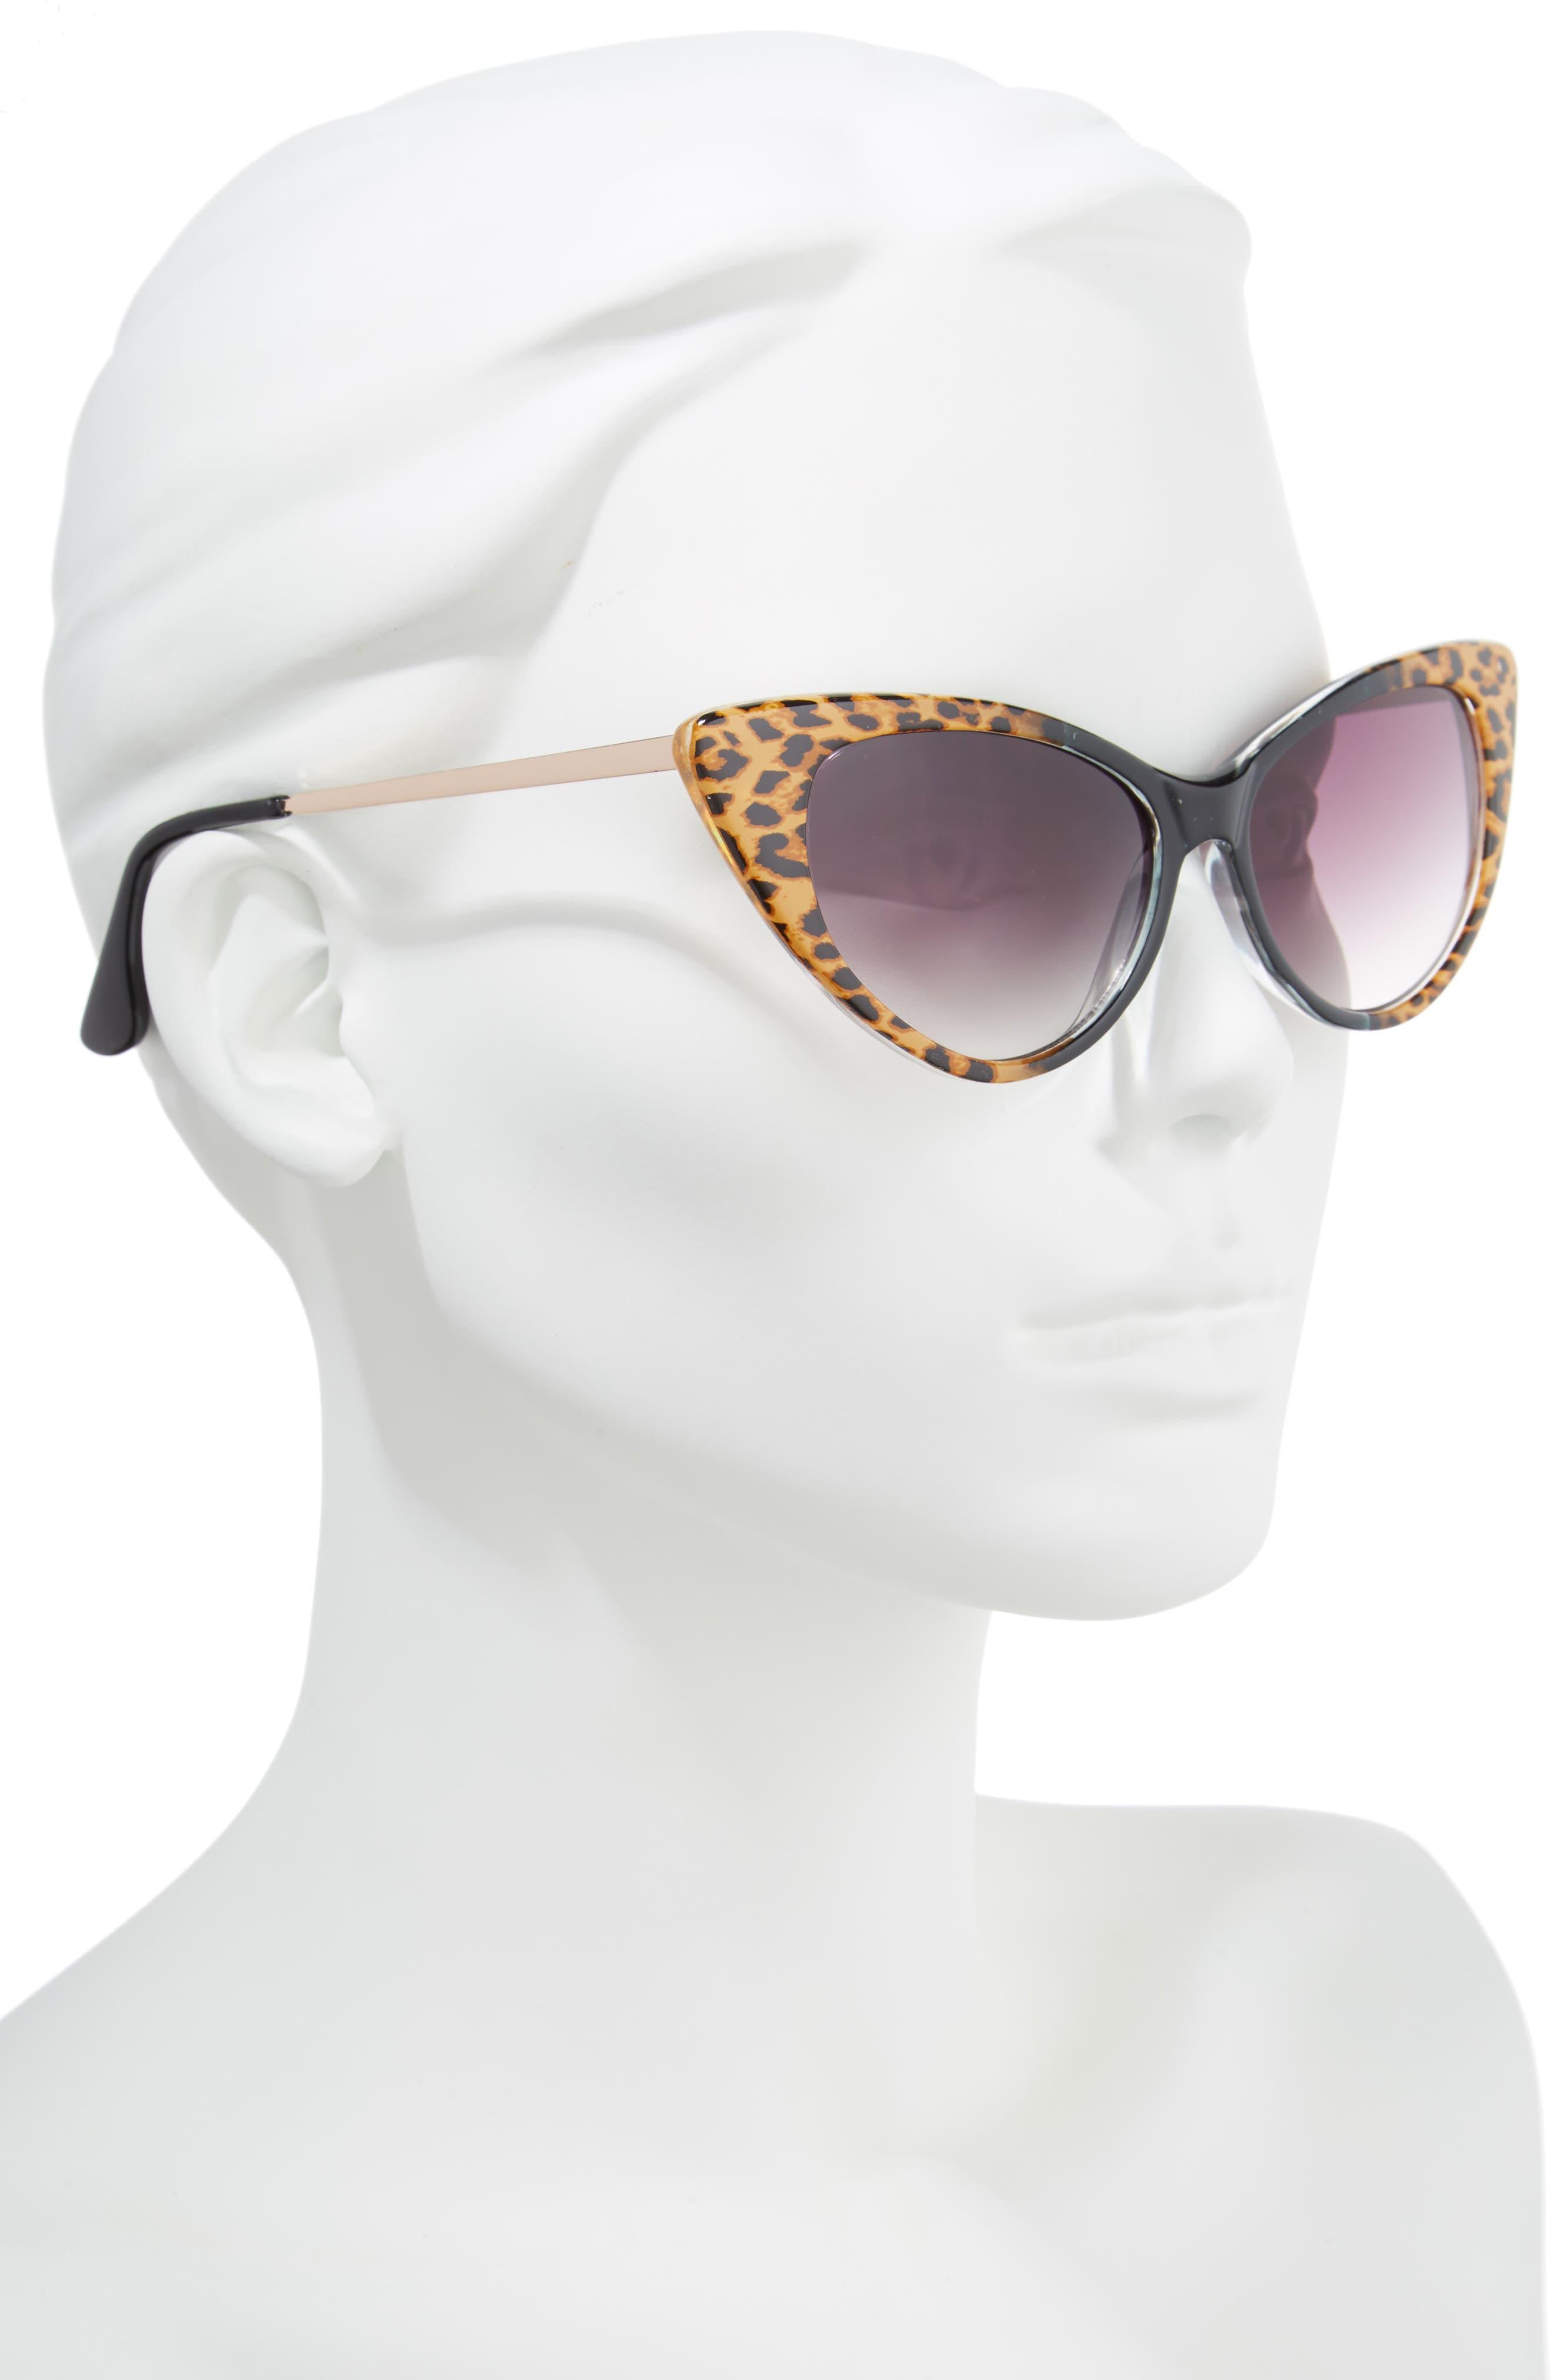 62mm Leopard Print Cat Eye Sunglasses,                             Alternate thumbnail 2, color,                             Leopard/ Black